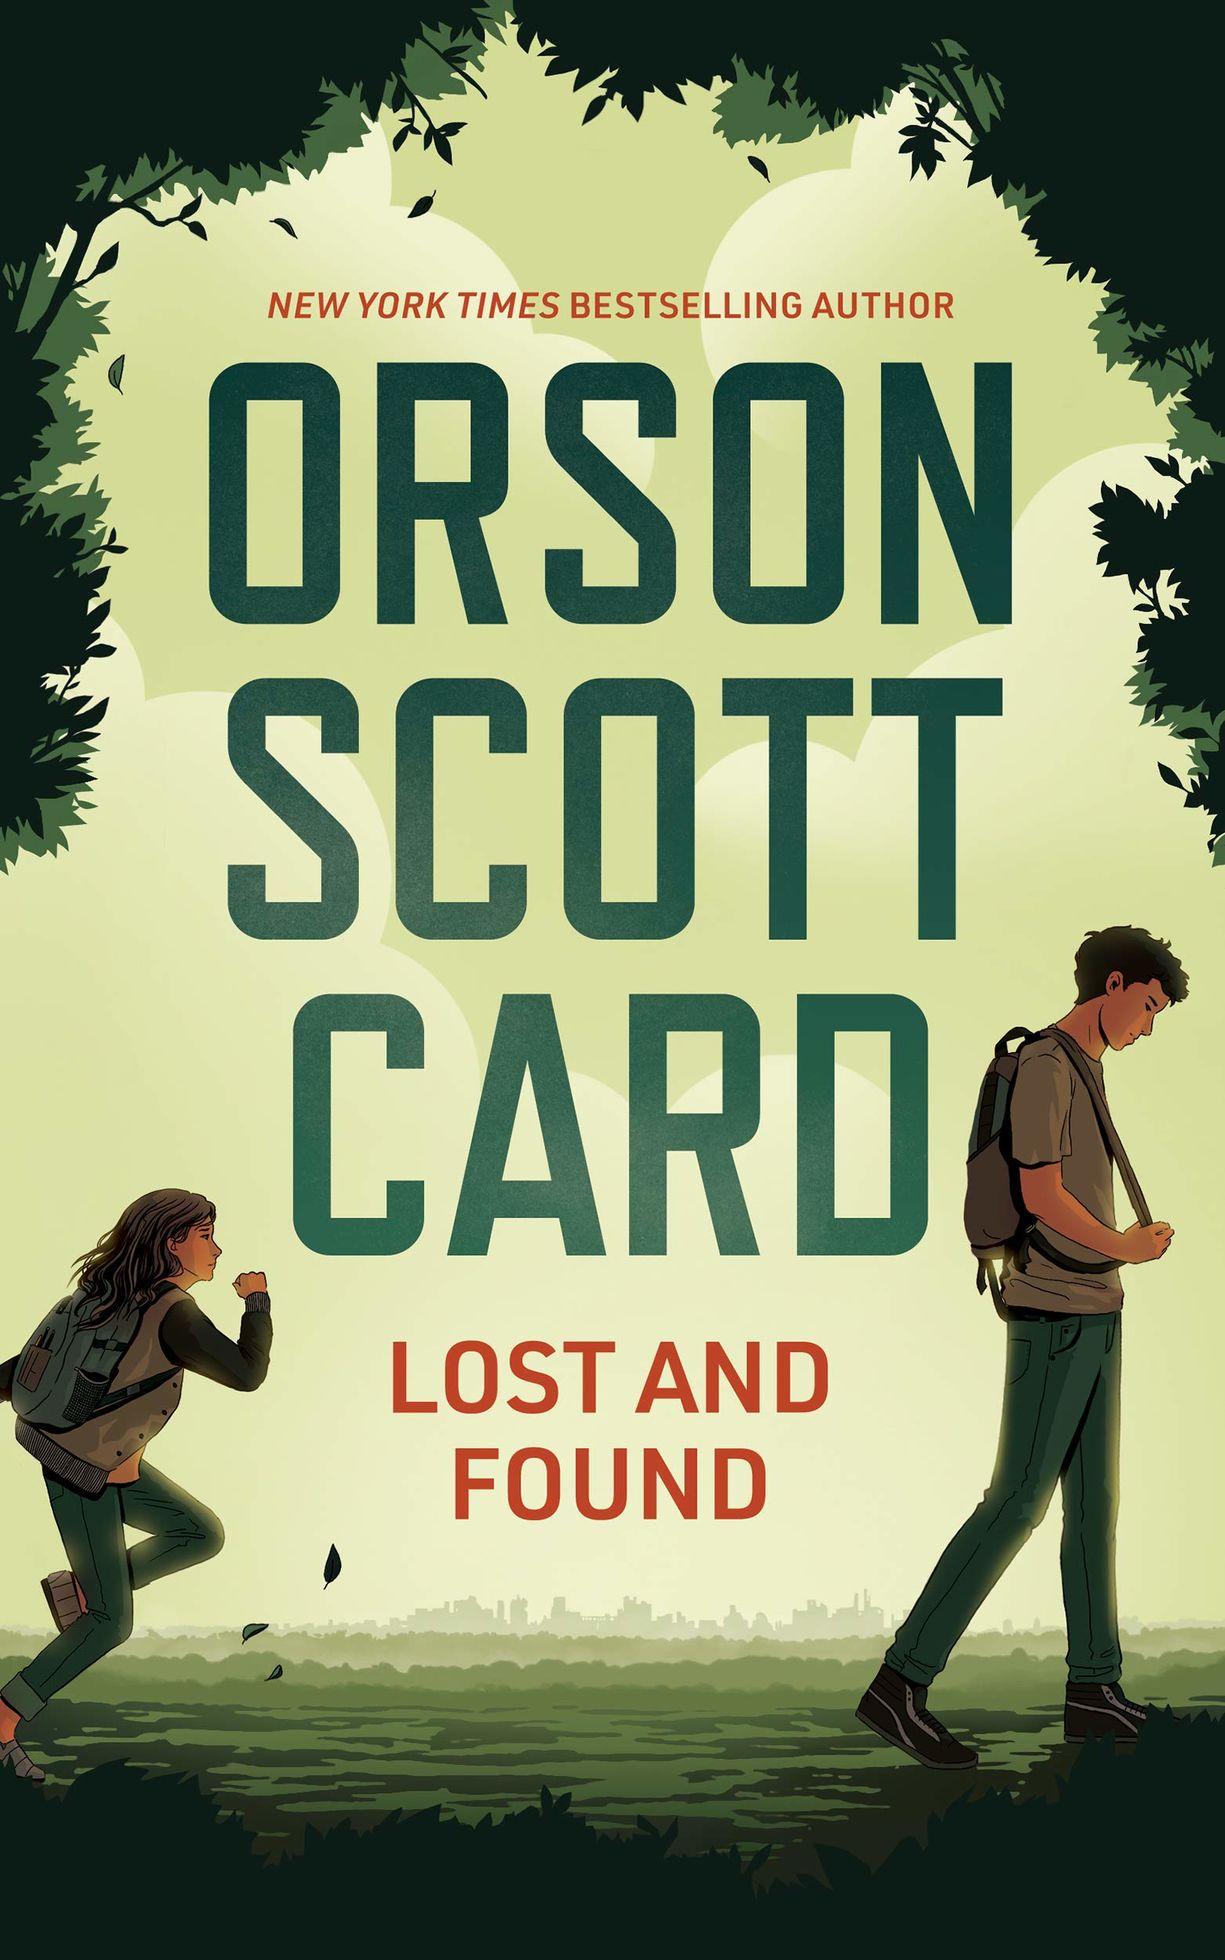 Lost and Found - Le dernier roman d'Orson Scott Card